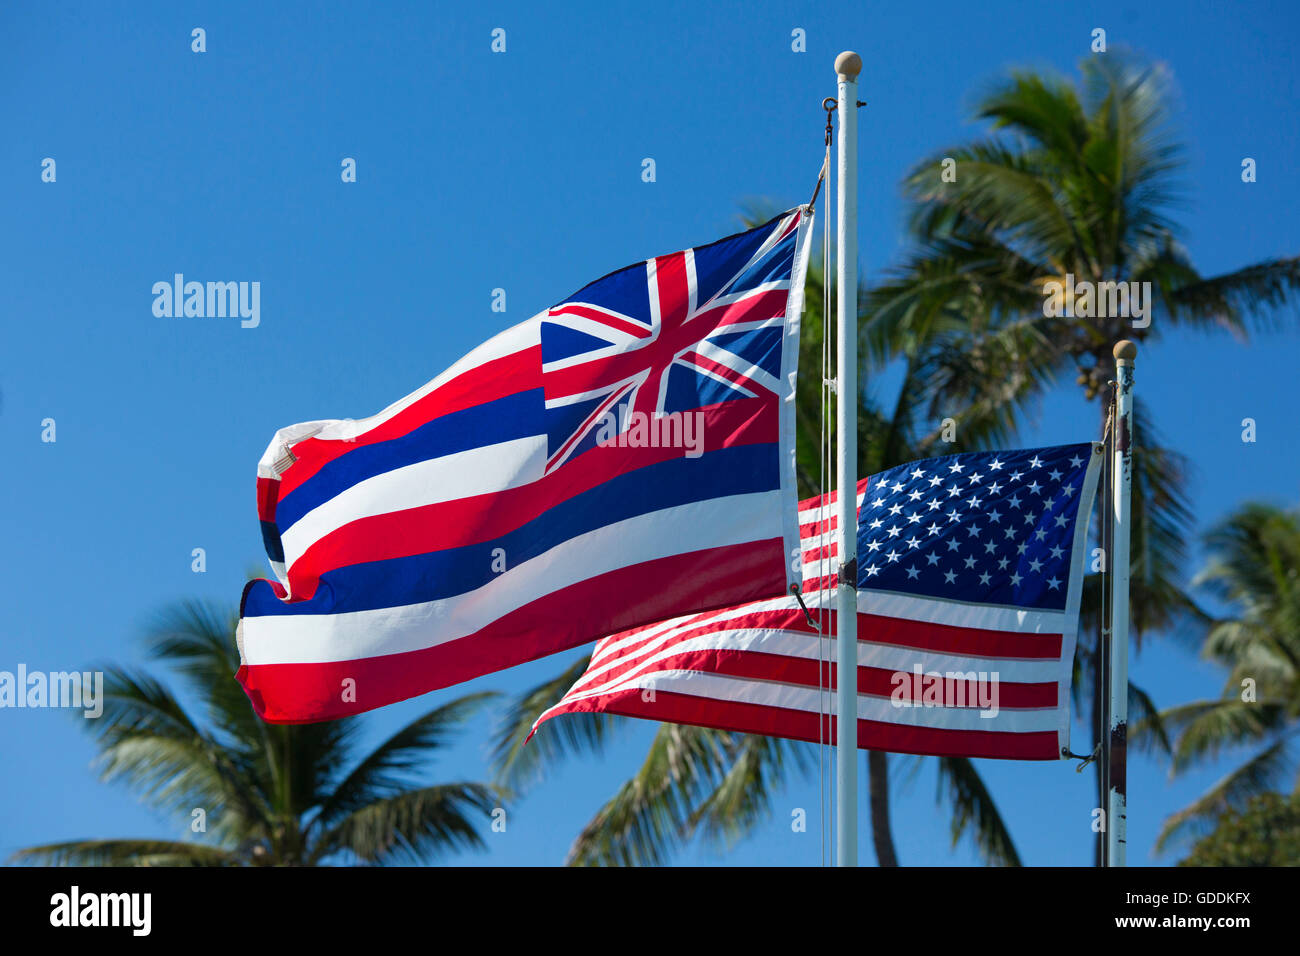 Maui,US flag,banner,USA,Hawaii,America,flag,flags,palms, - Stock Image